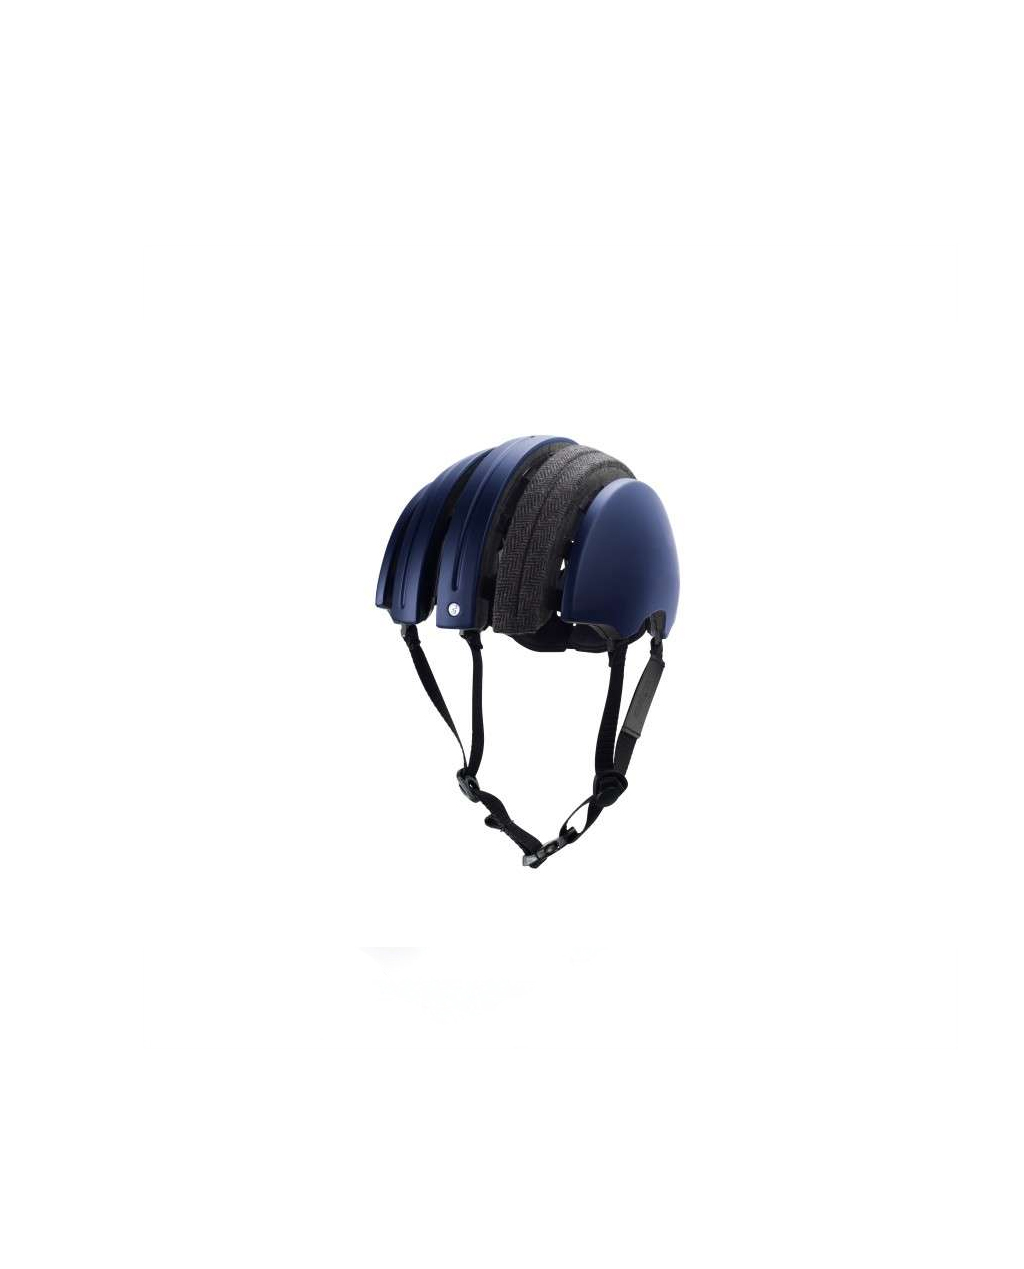 Brooks - Carrera Foldable Helmet - Dark Blue / Grey